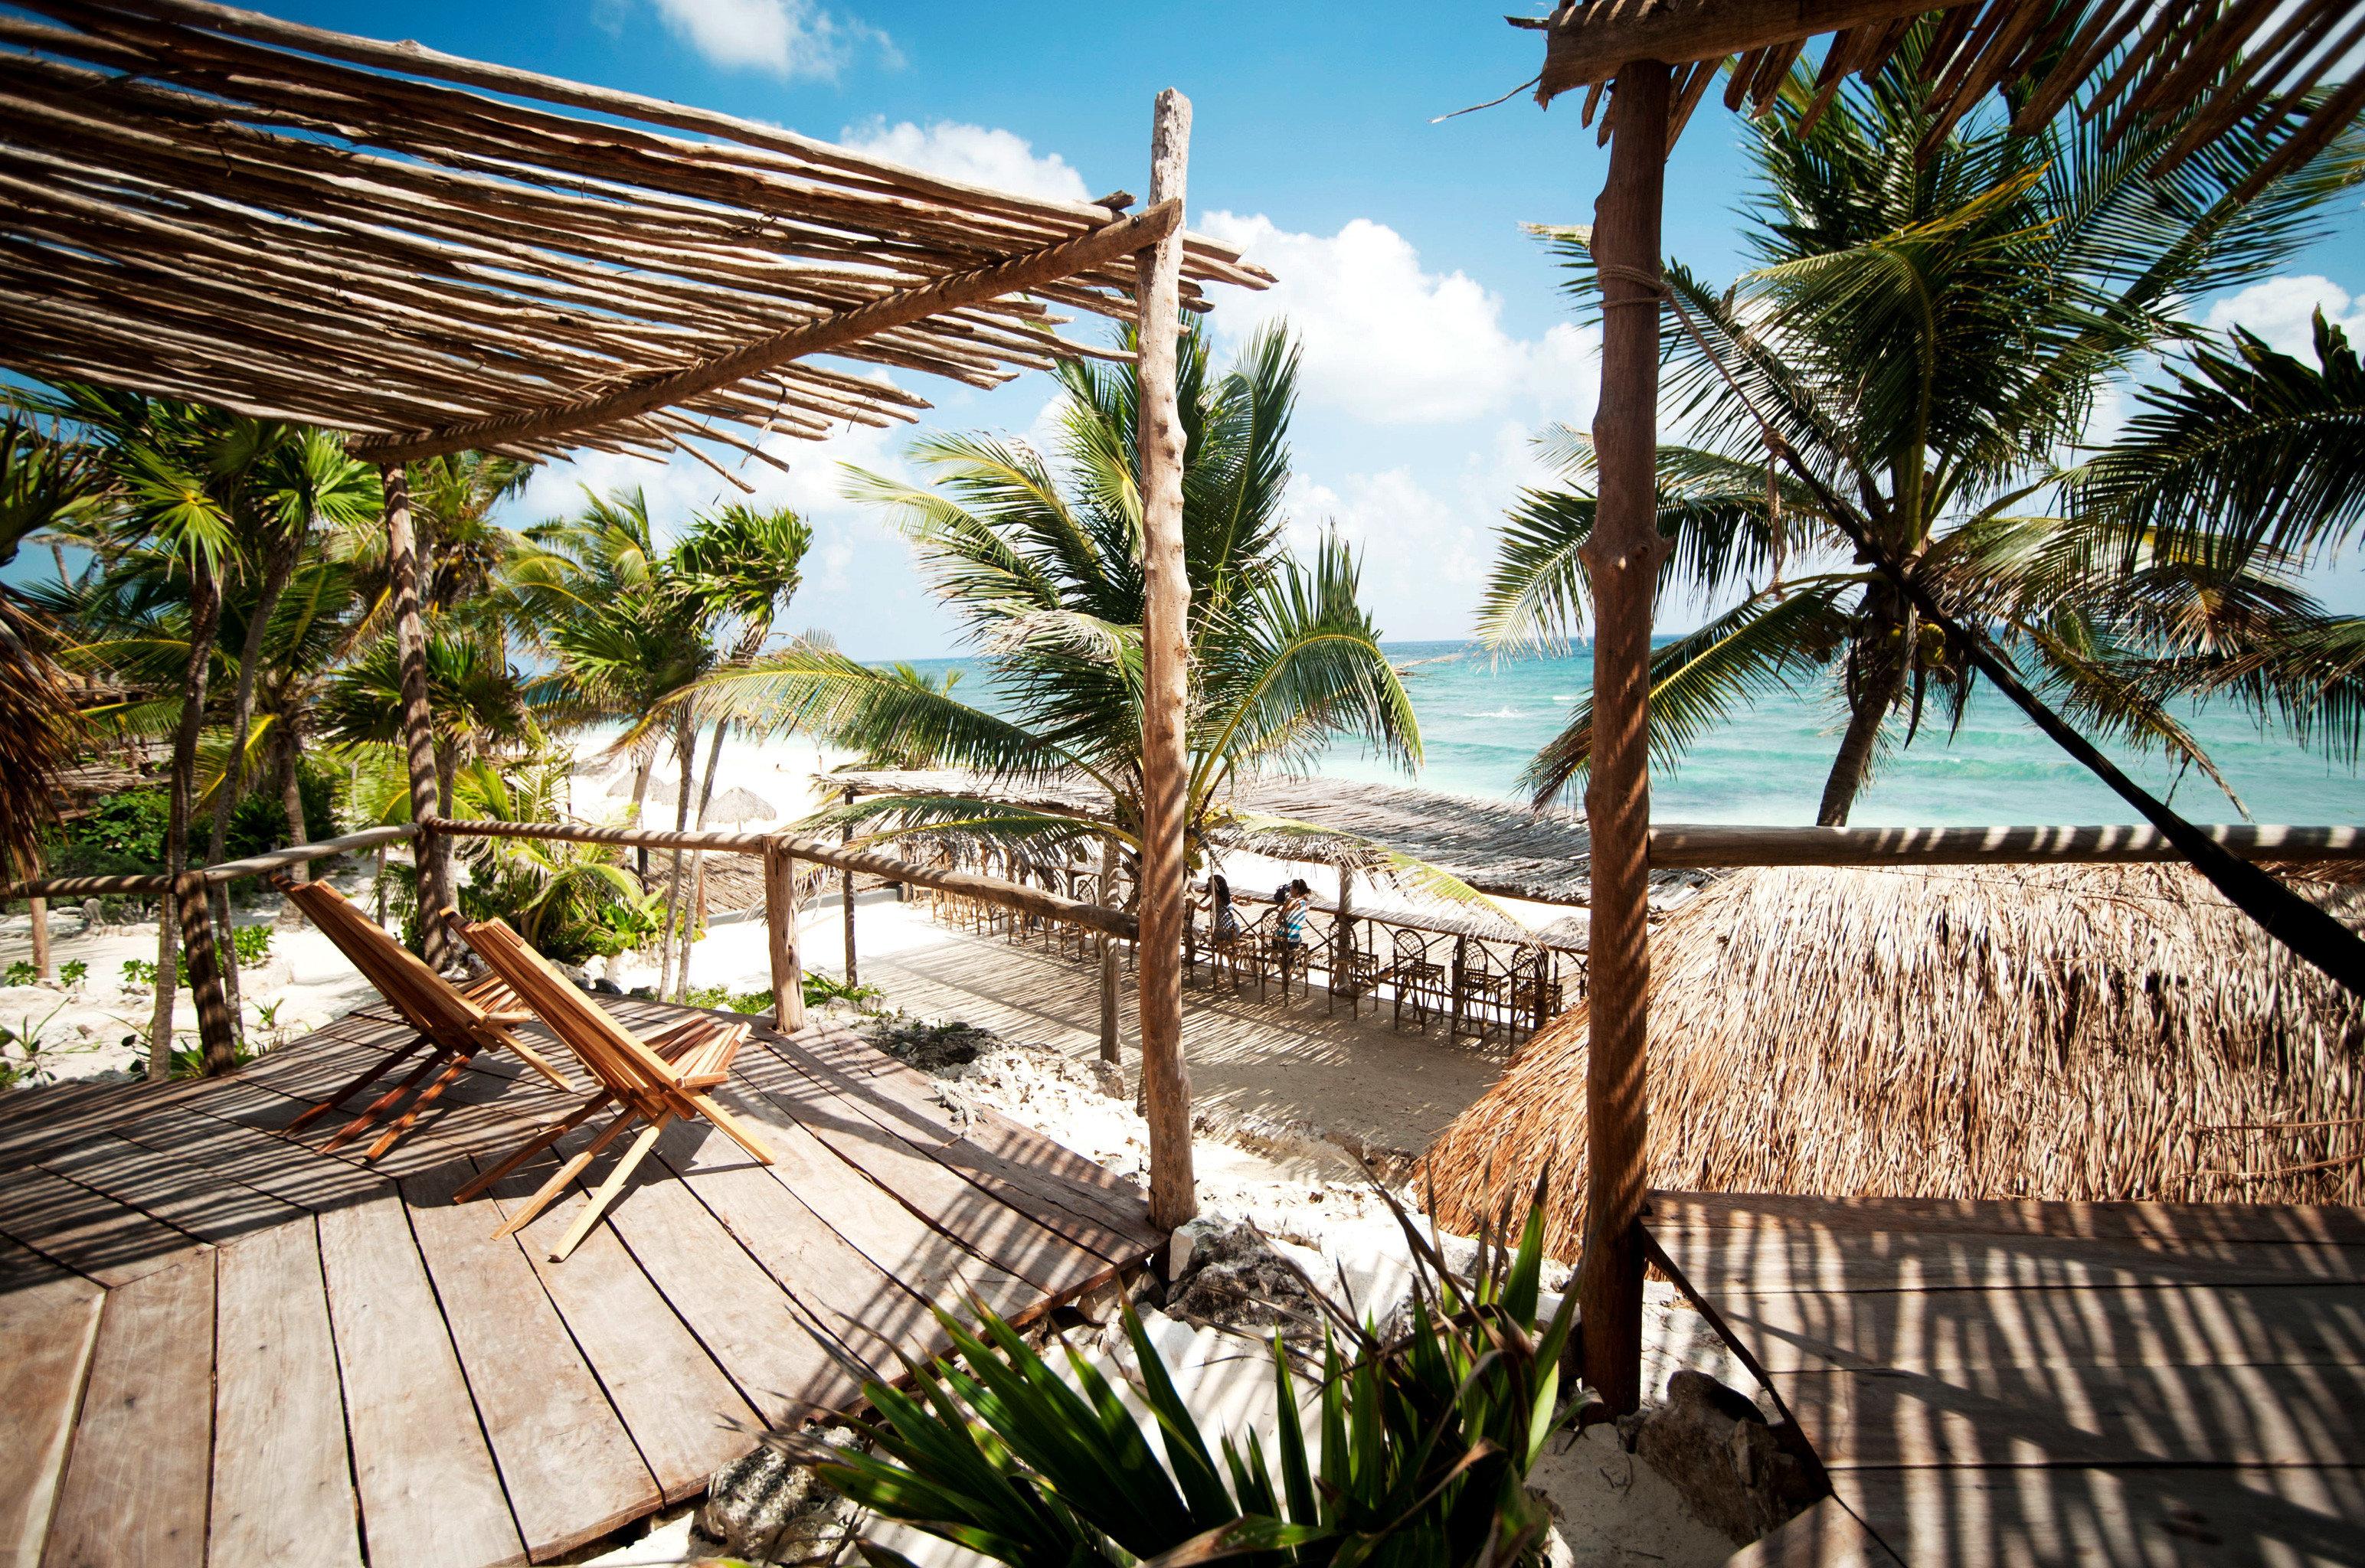 Eco Hotel Playa Maderas